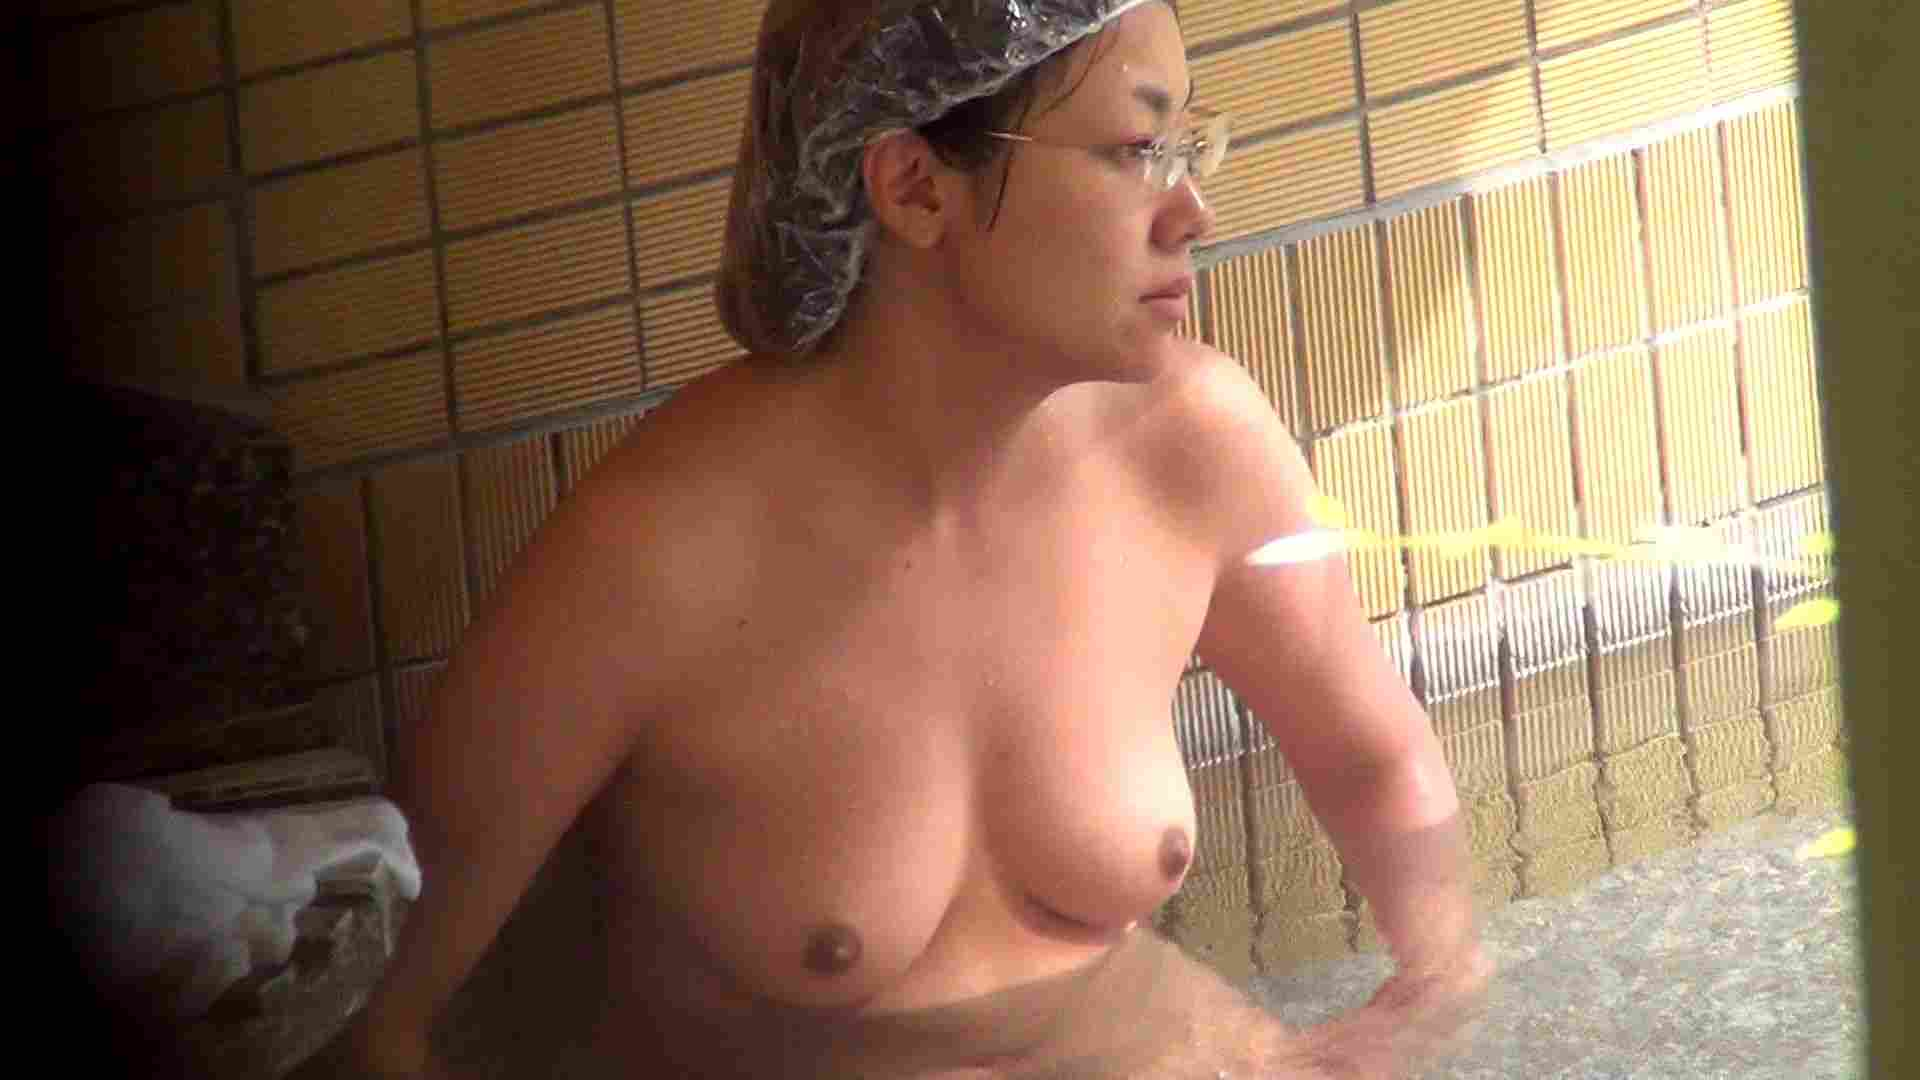 Aquaな露天風呂Vol.280 OLセックス  91画像 81